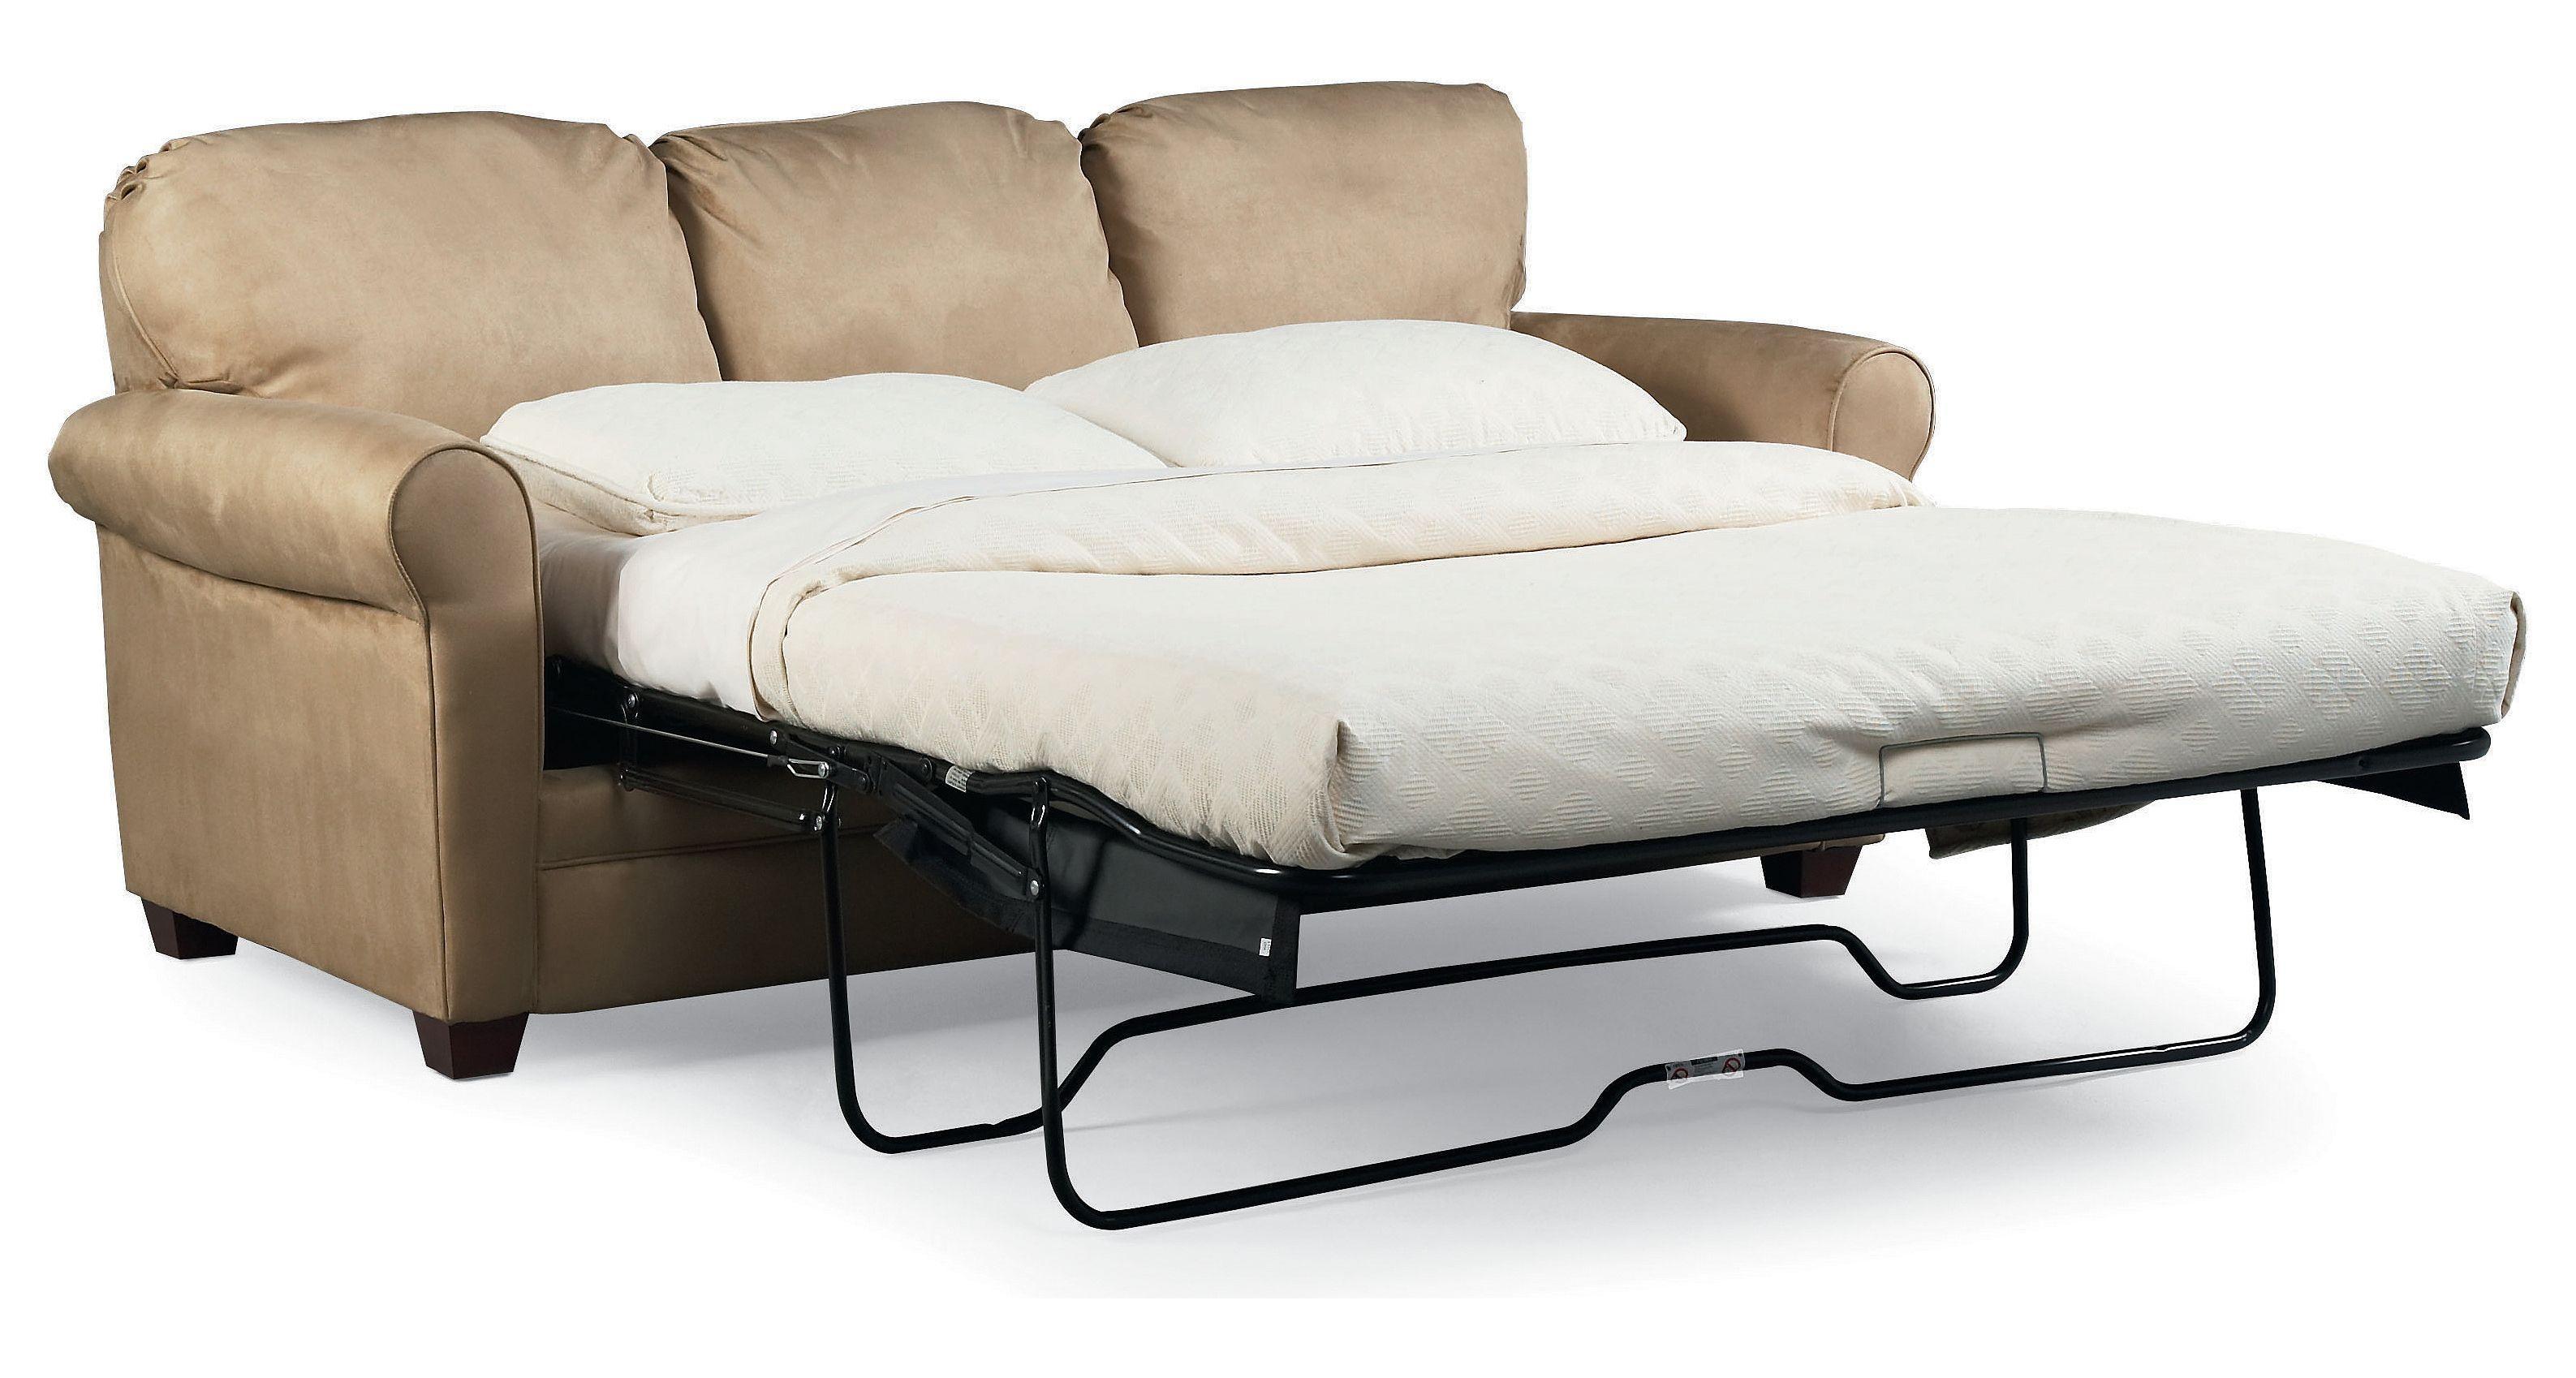 dwr bay sleeper sofa review dundee fc hearts sofascore 20 top craigslist sofas ideas